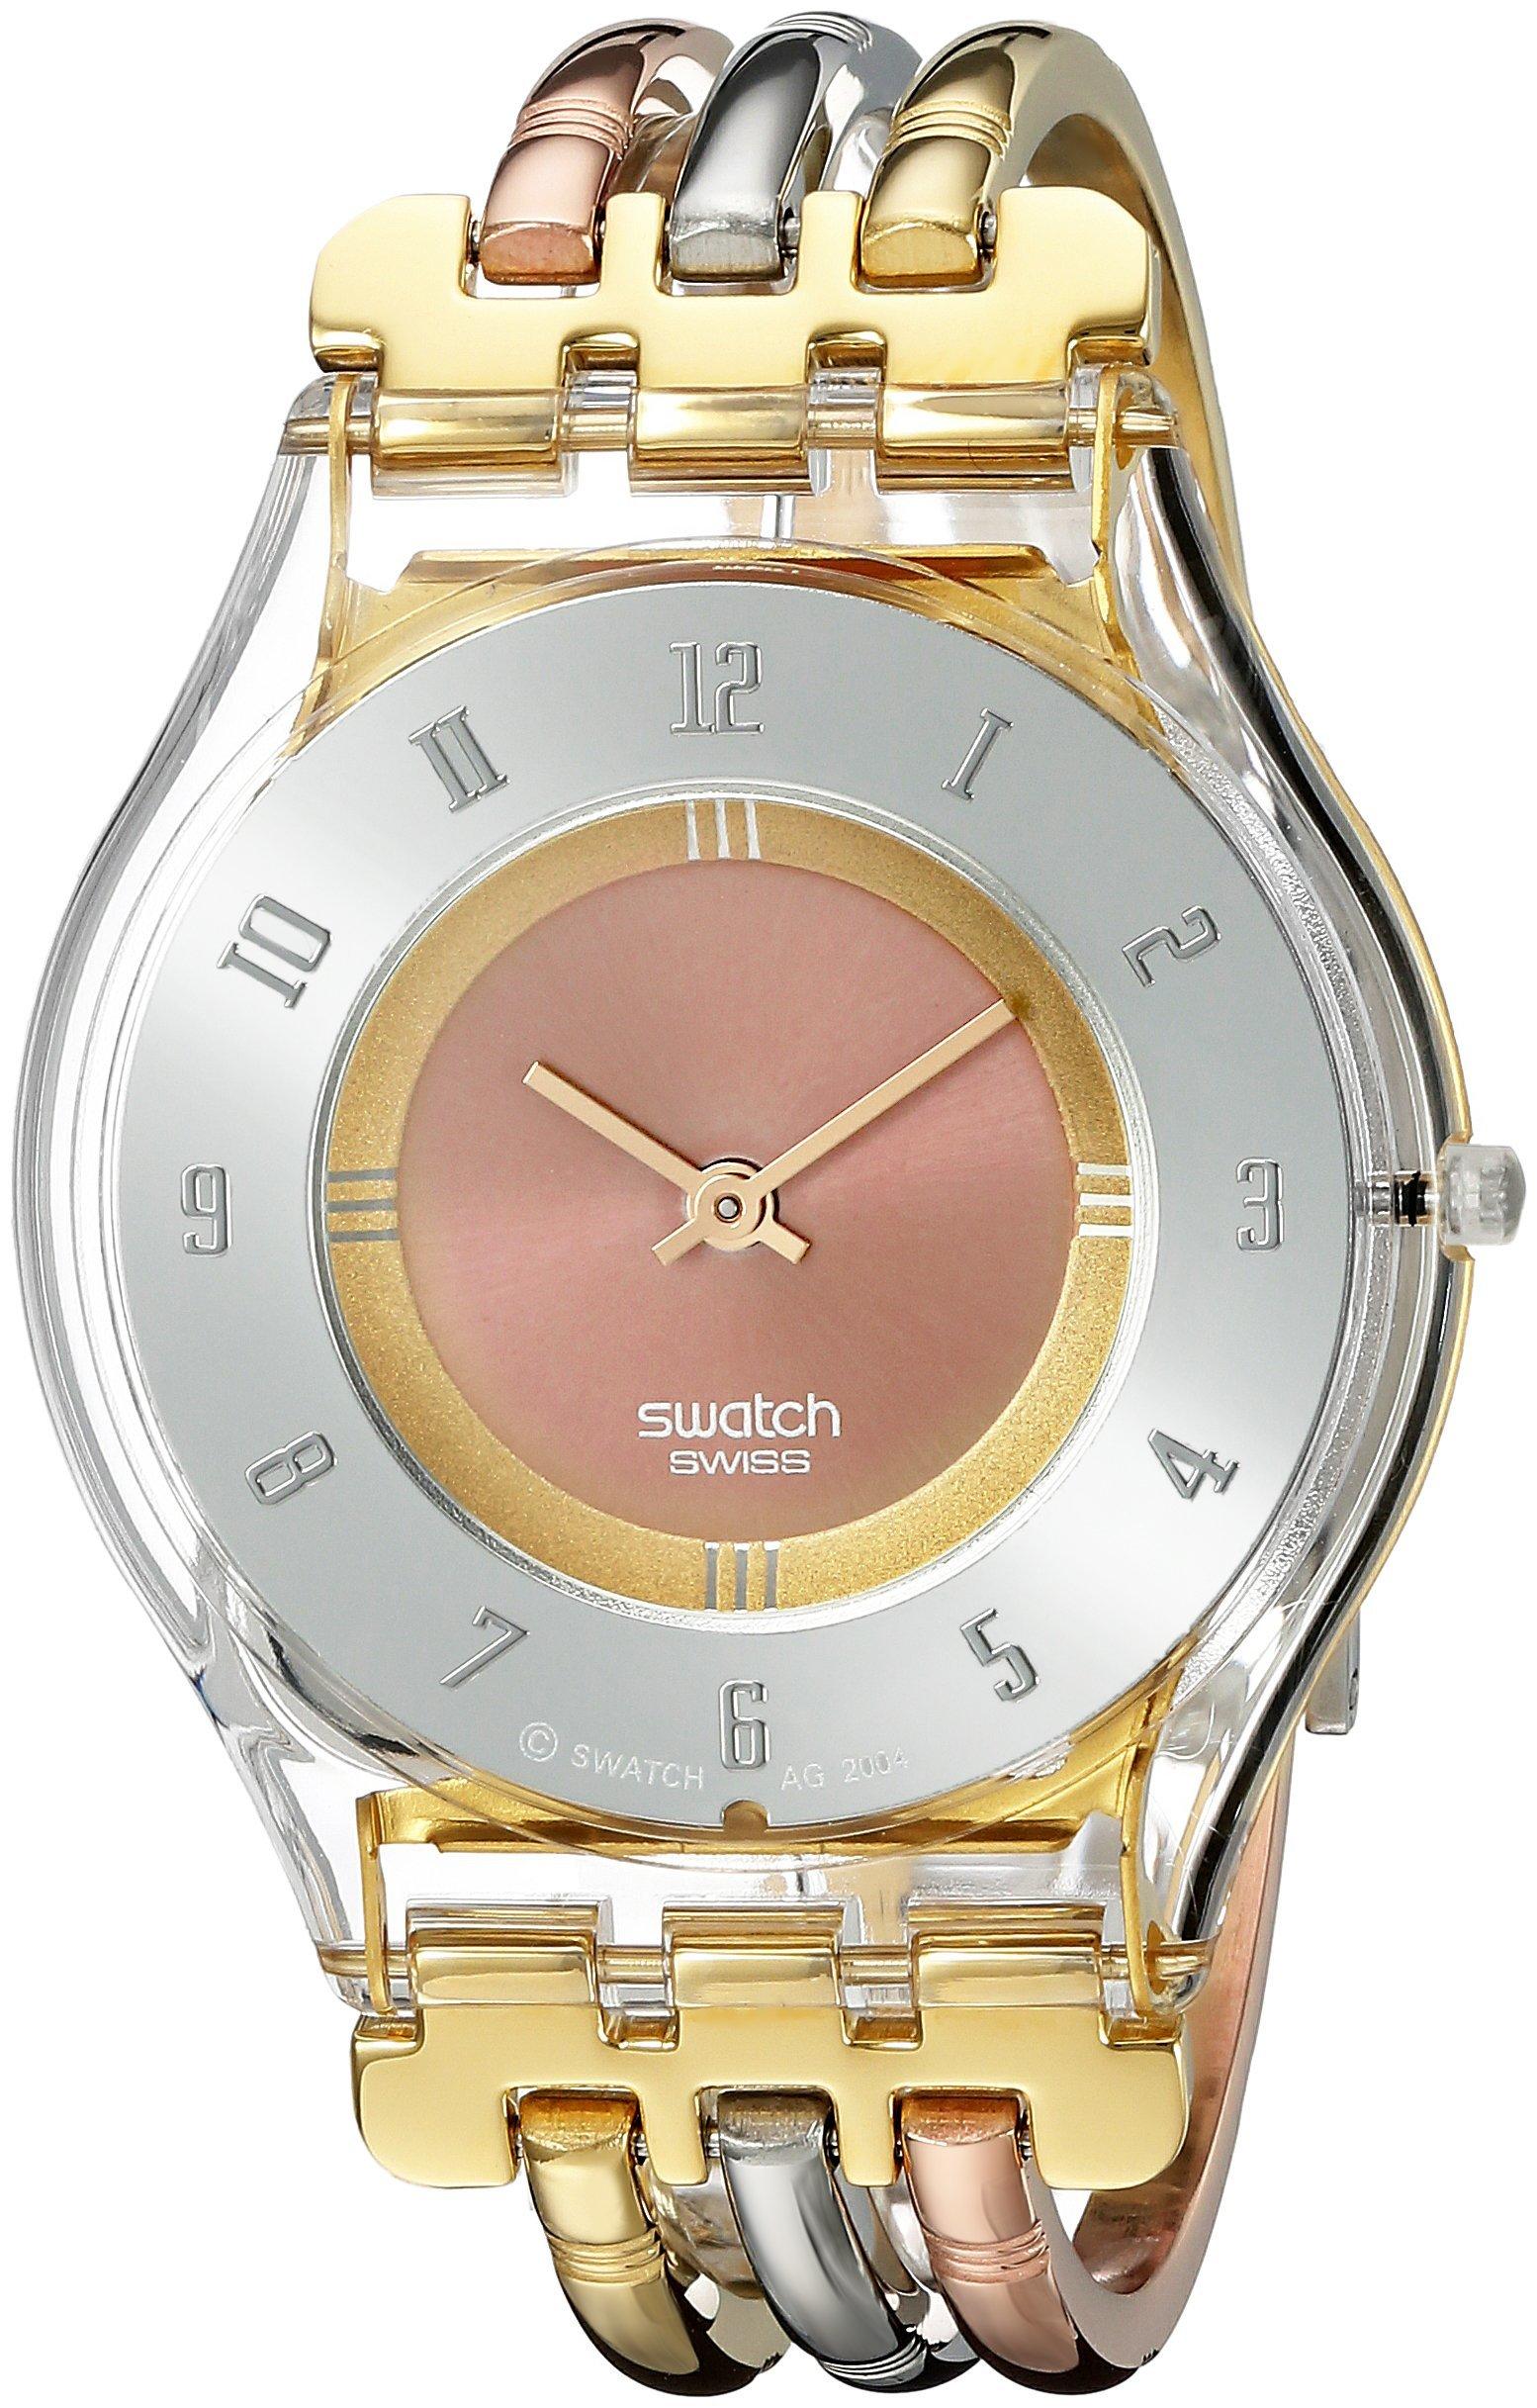 Swatch 007: Wristwatches eBay